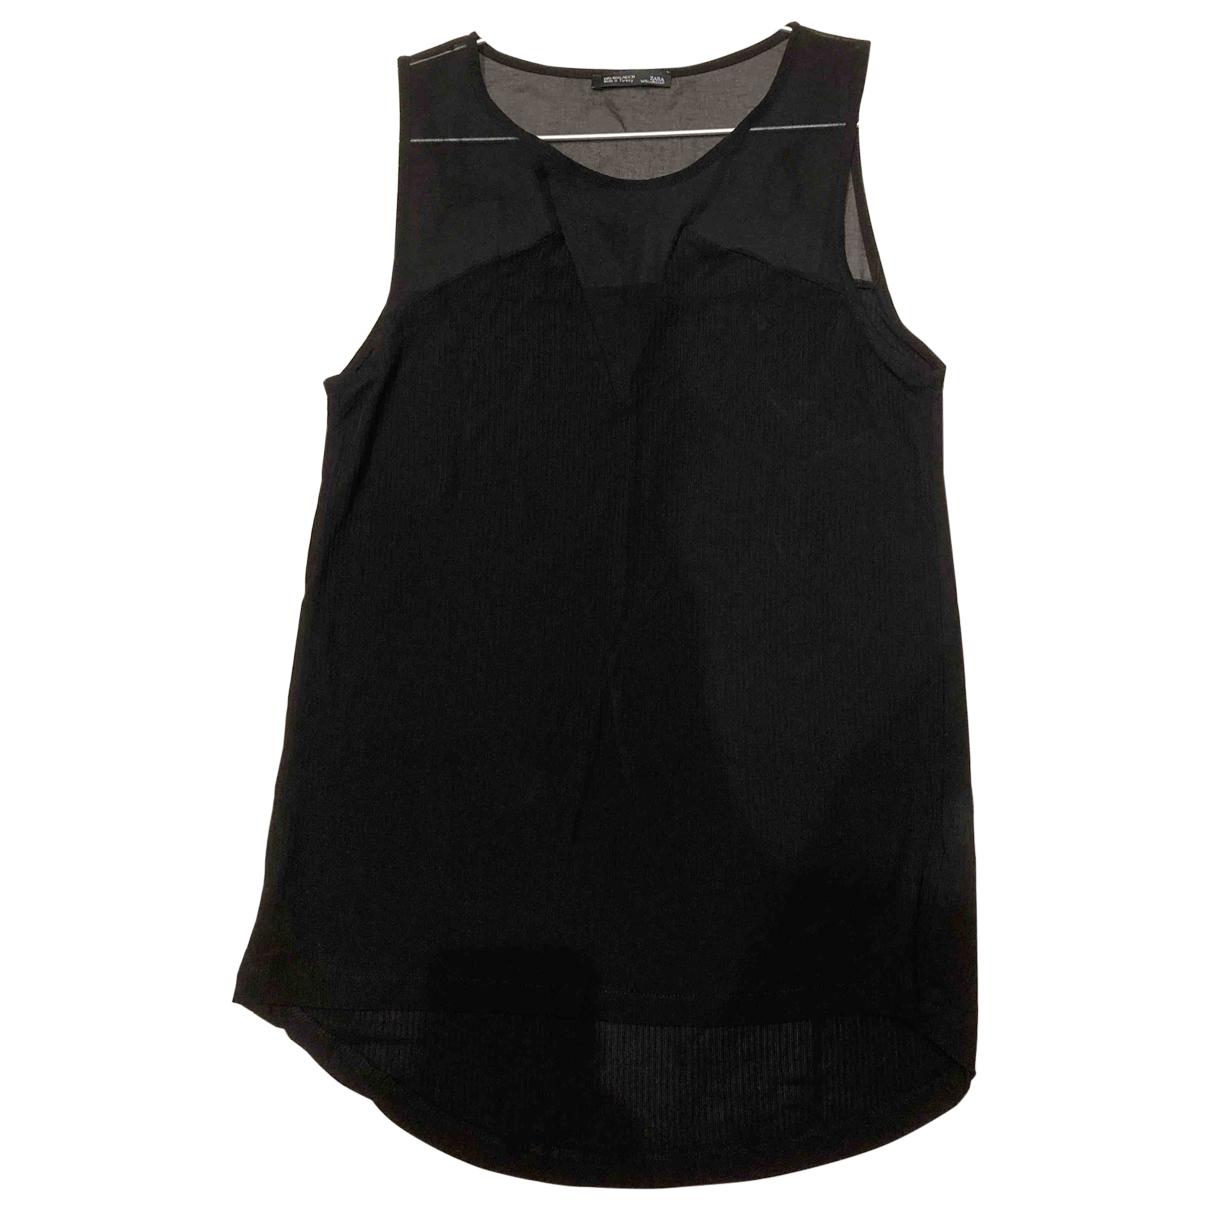 Zara \N Black Cotton  top for Women L International